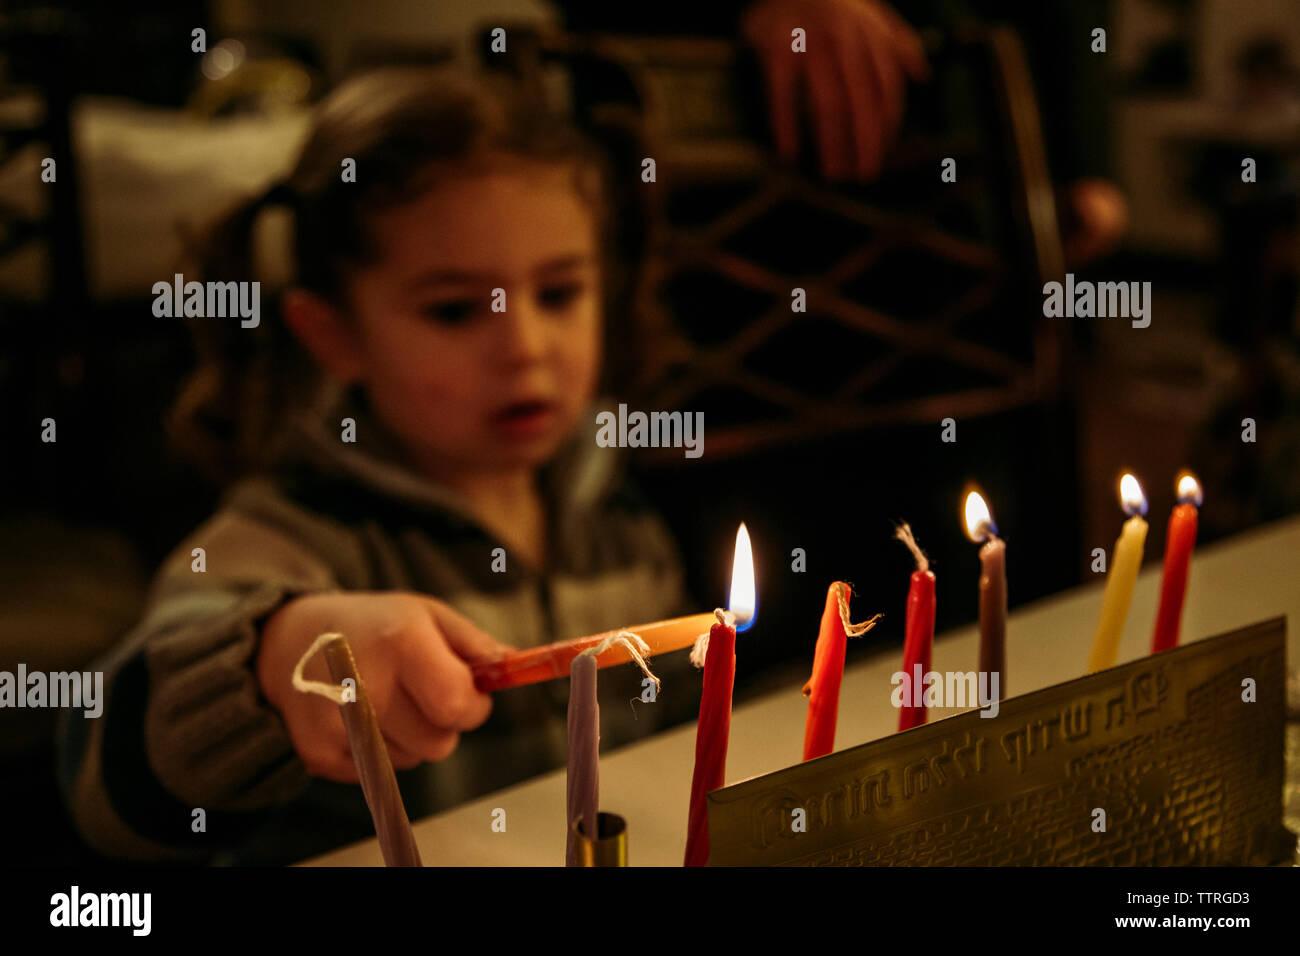 Close-up of girl allumer des bougies pendant 'Hanoucca Photo Stock